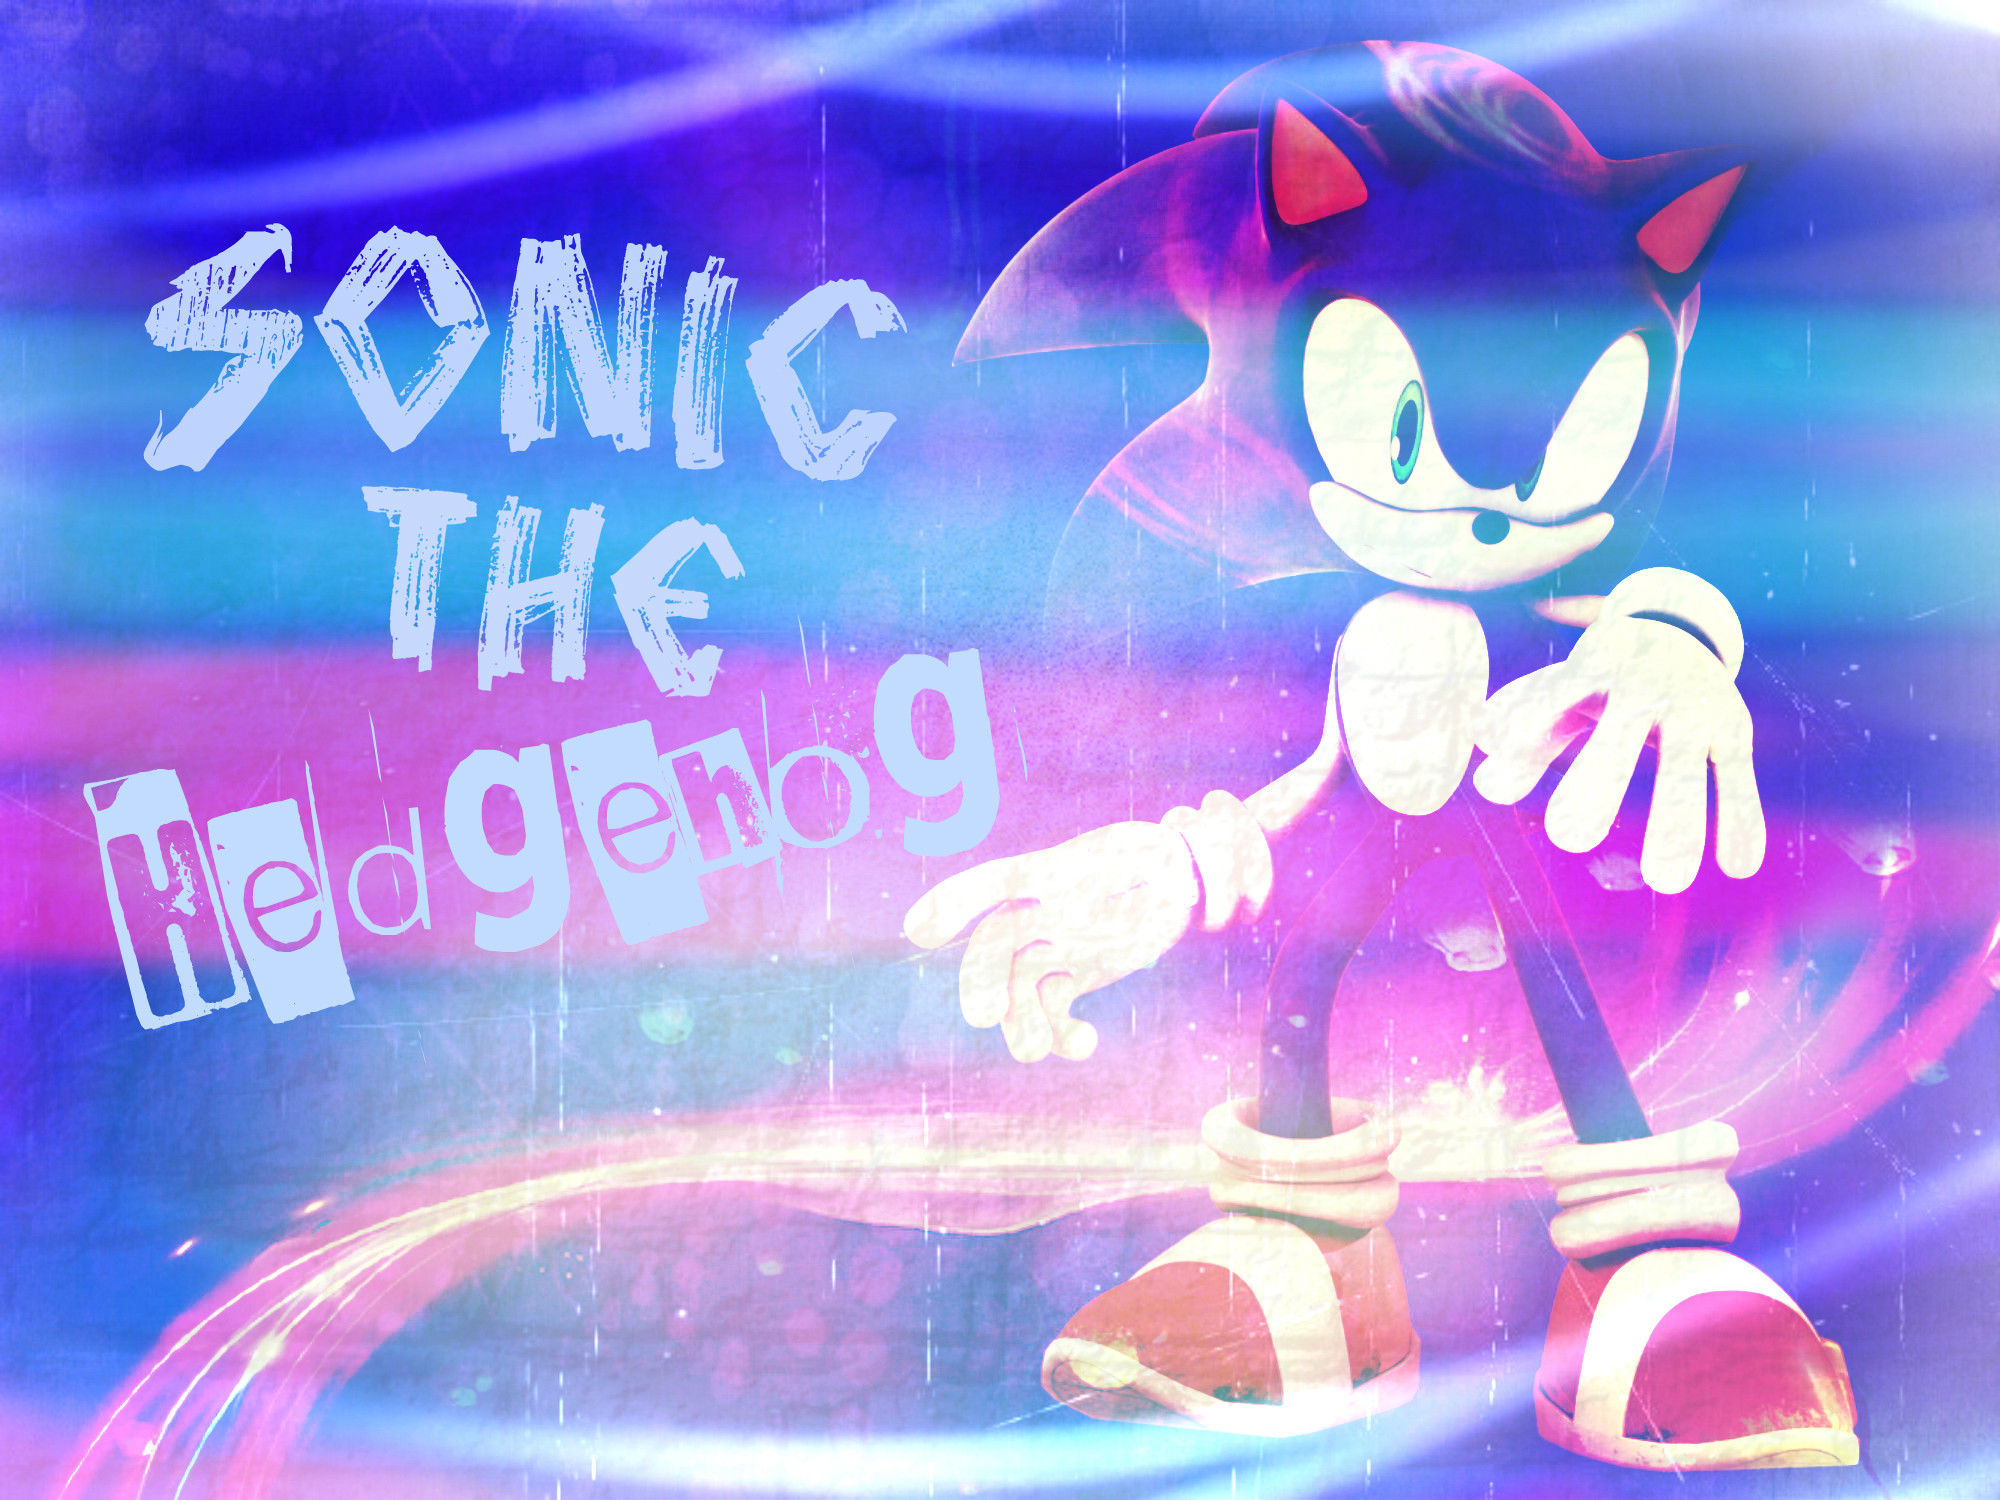 Sonic The Hedgehog Wallpaper by LuniiCookiez Sonic The Hedgehog Wallpaper  by LuniiCookiez